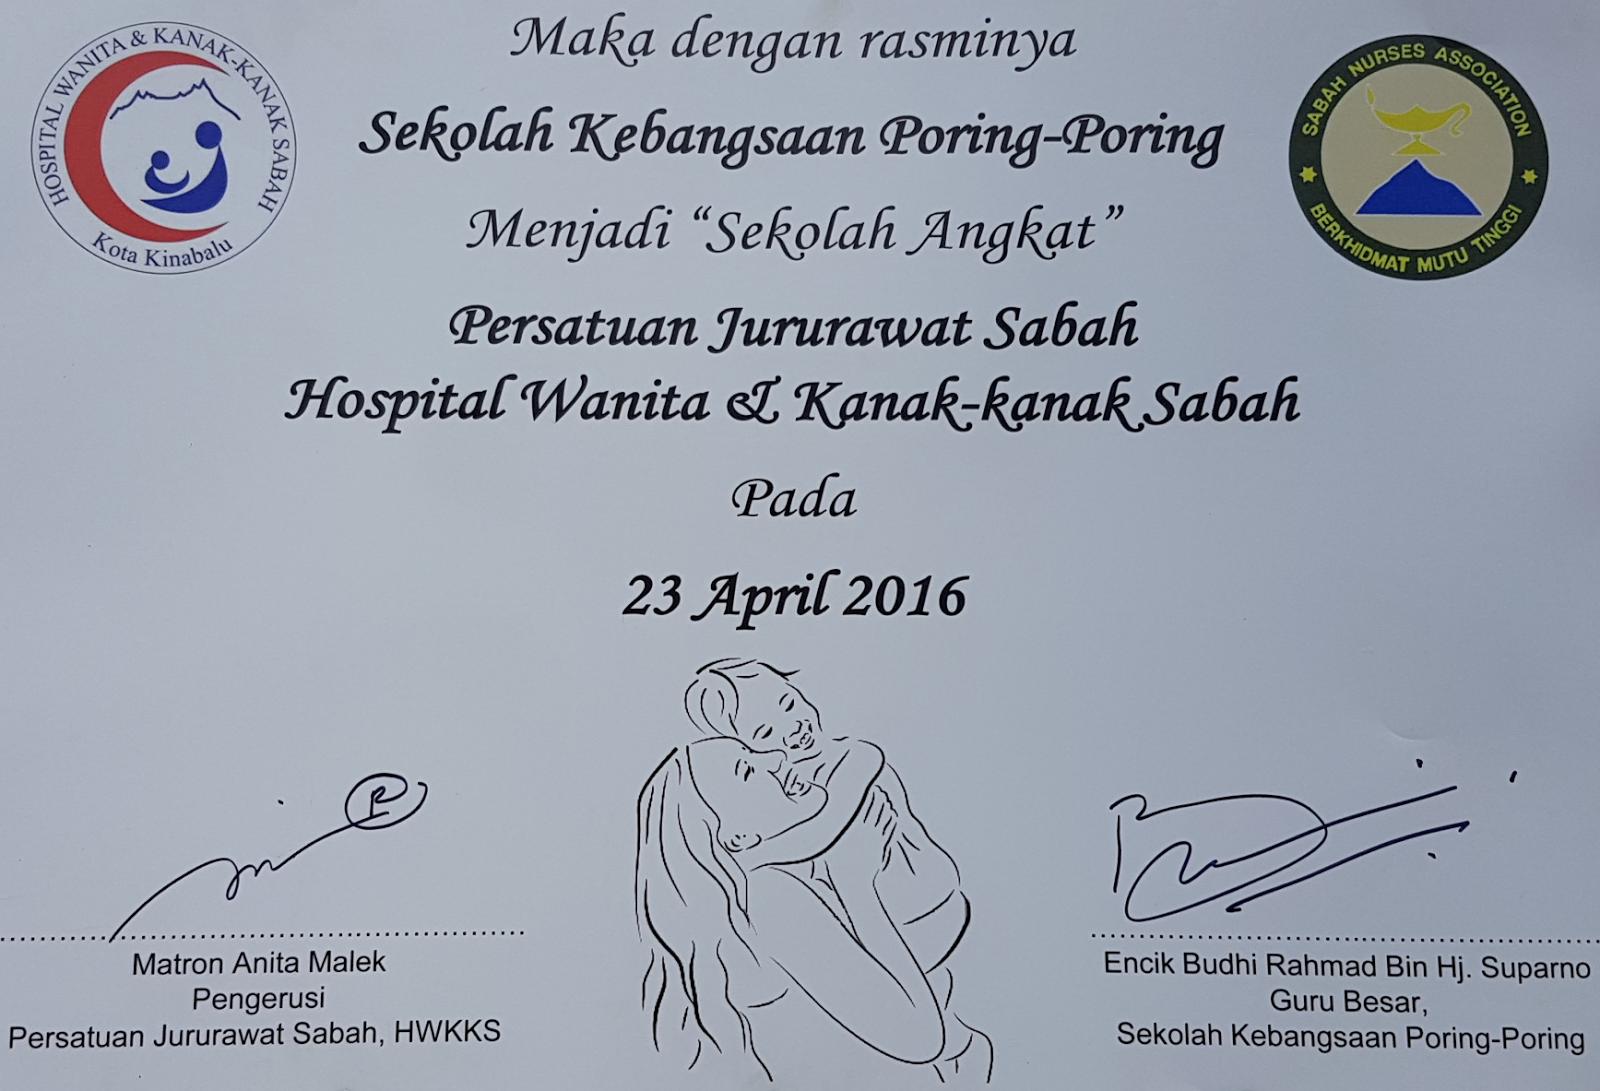 Persatuan Jururawat Sabah, Hospital Wanita dan Kanak-Kanak Sabah